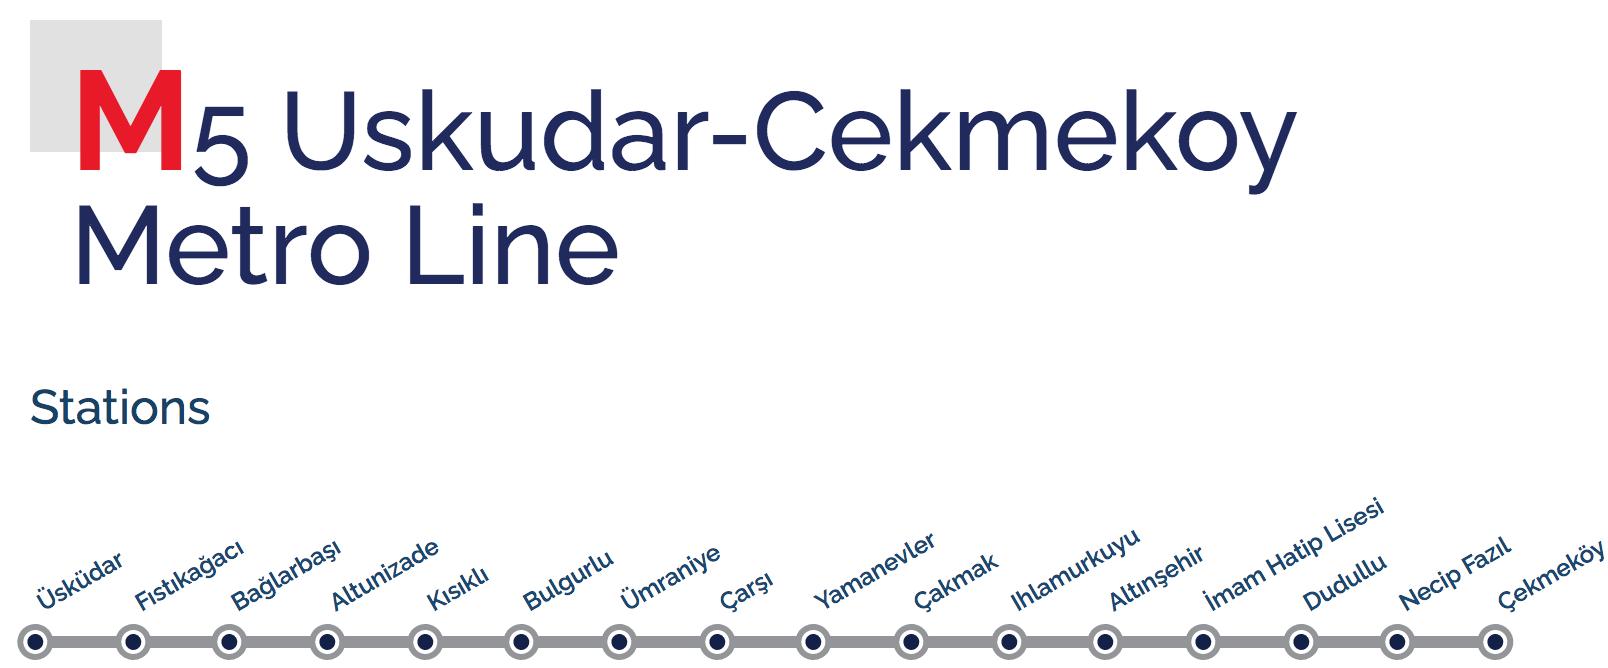 Маршрут метро М5